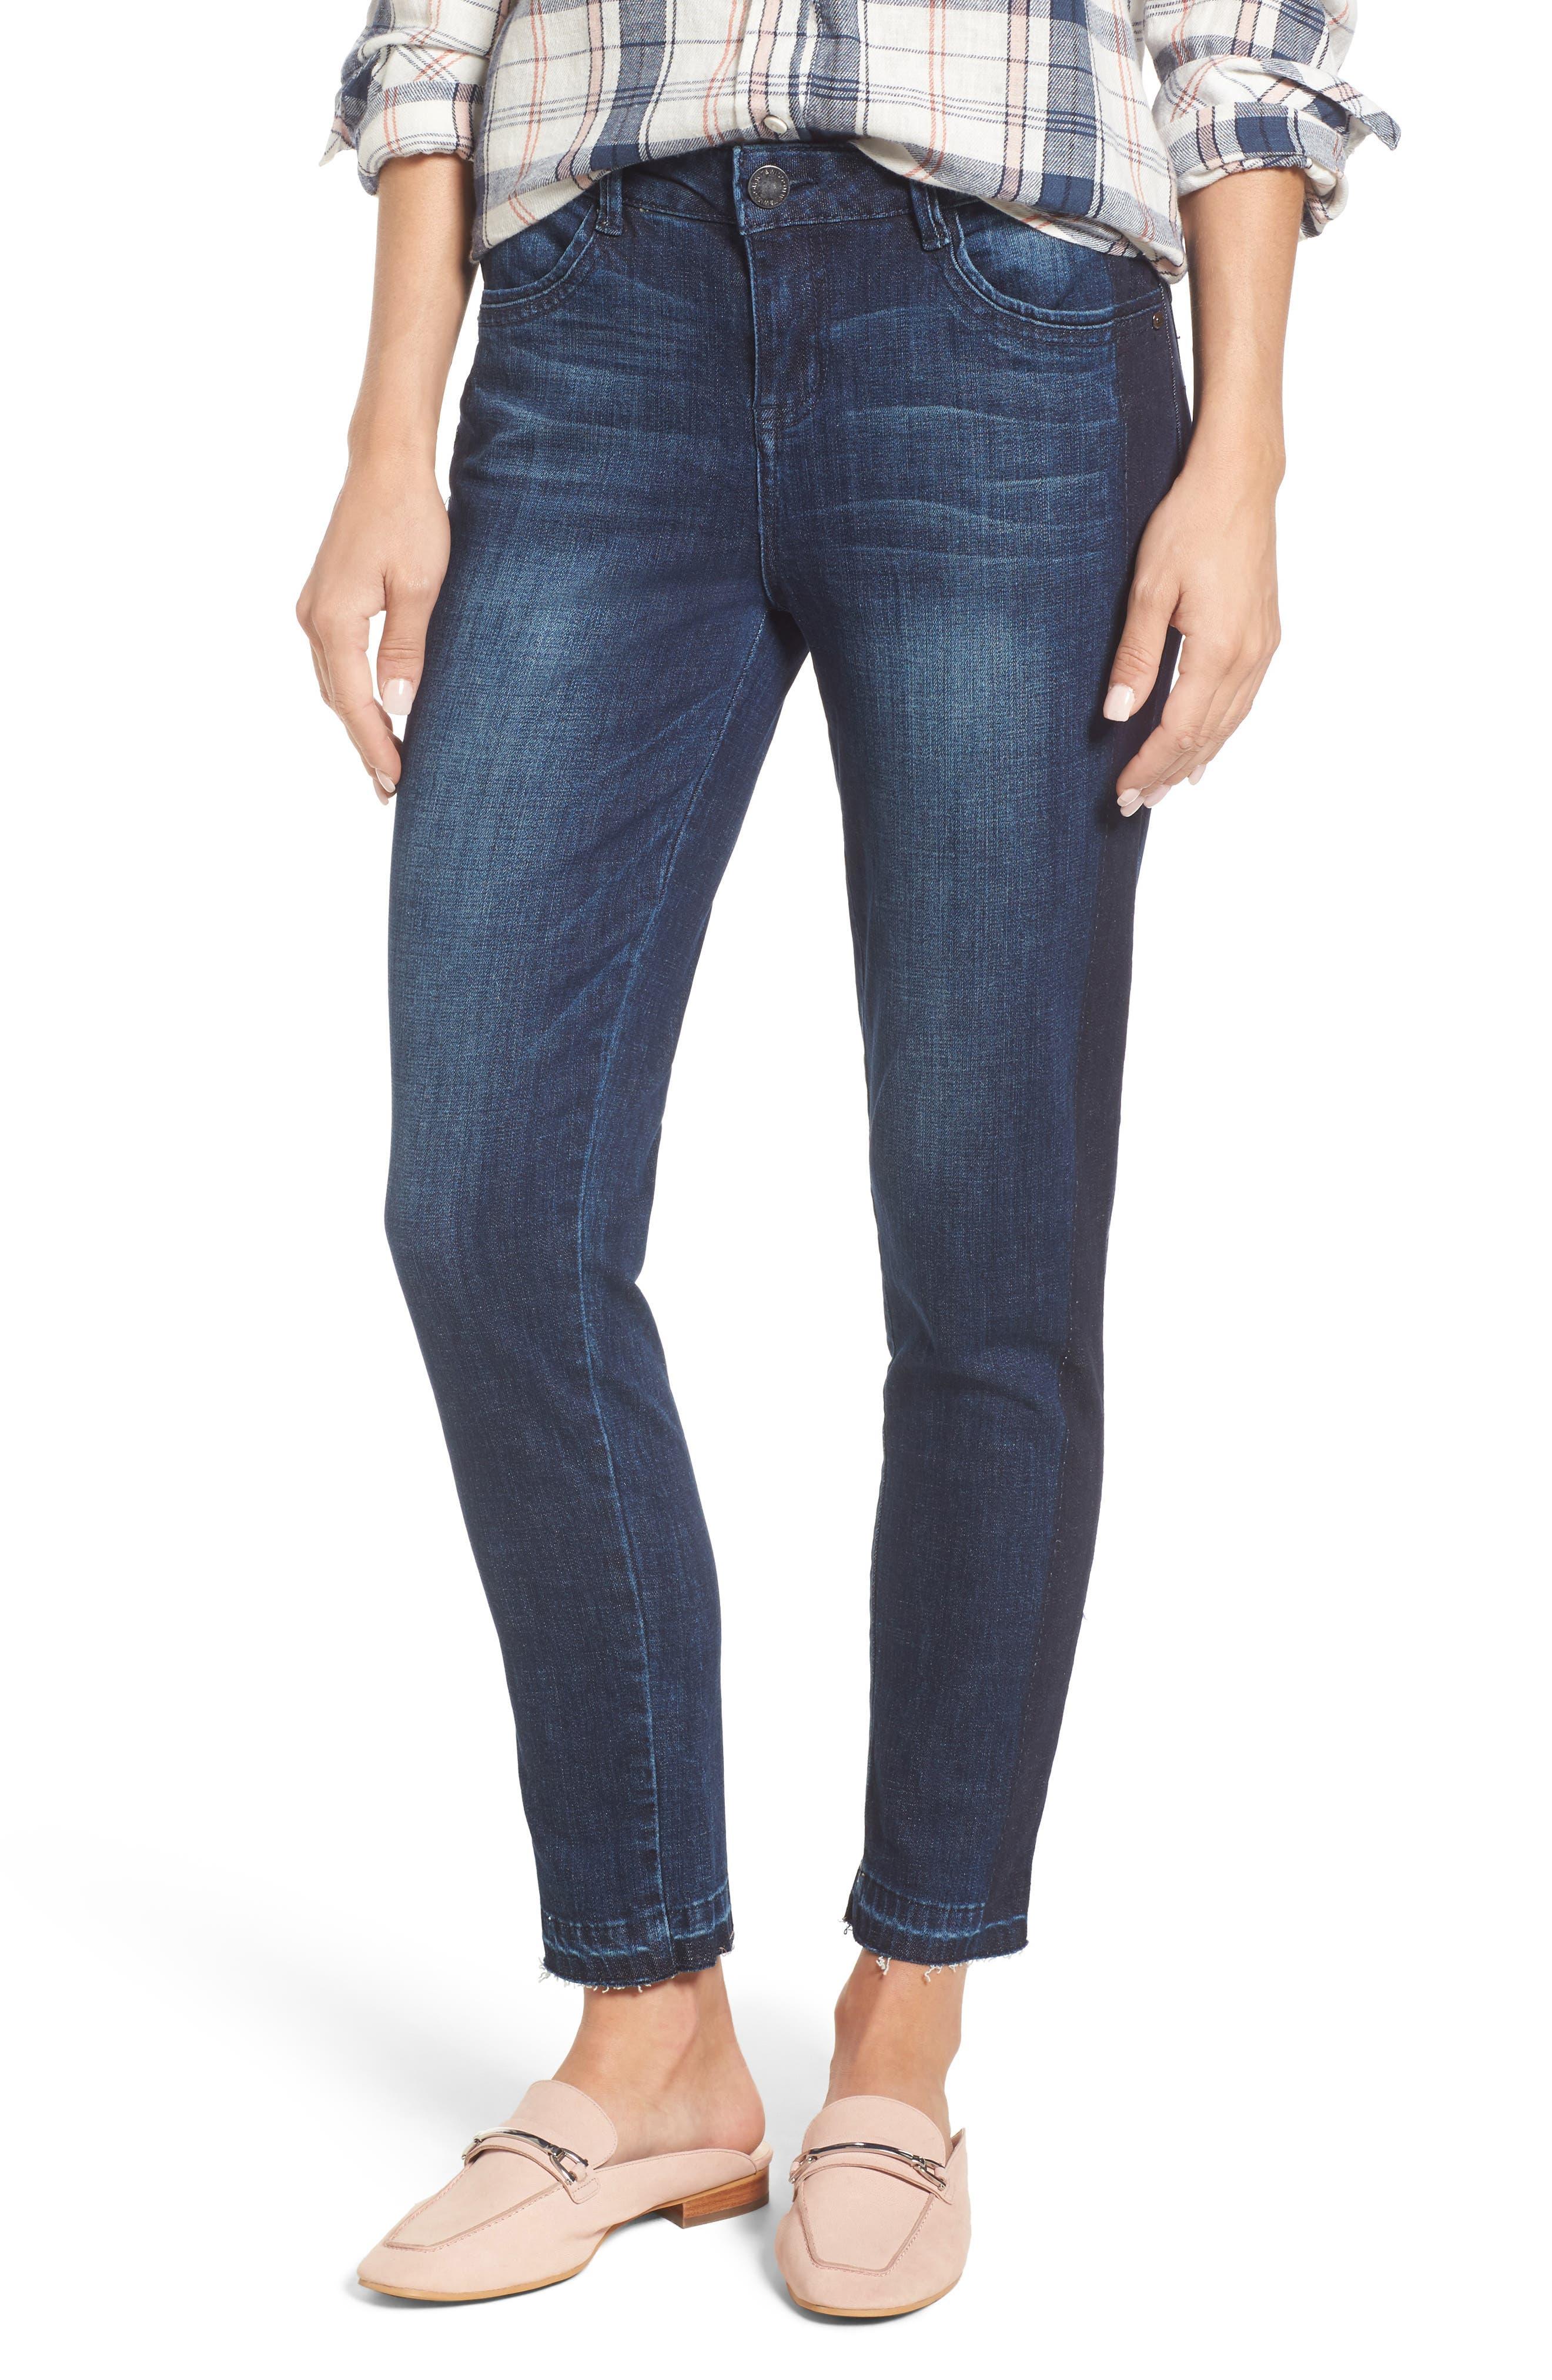 Alternate Image 1 Selected - Wit & Wisdom Tuxedo Stripe Skinny Jeans (Nordstrom Exclusive)